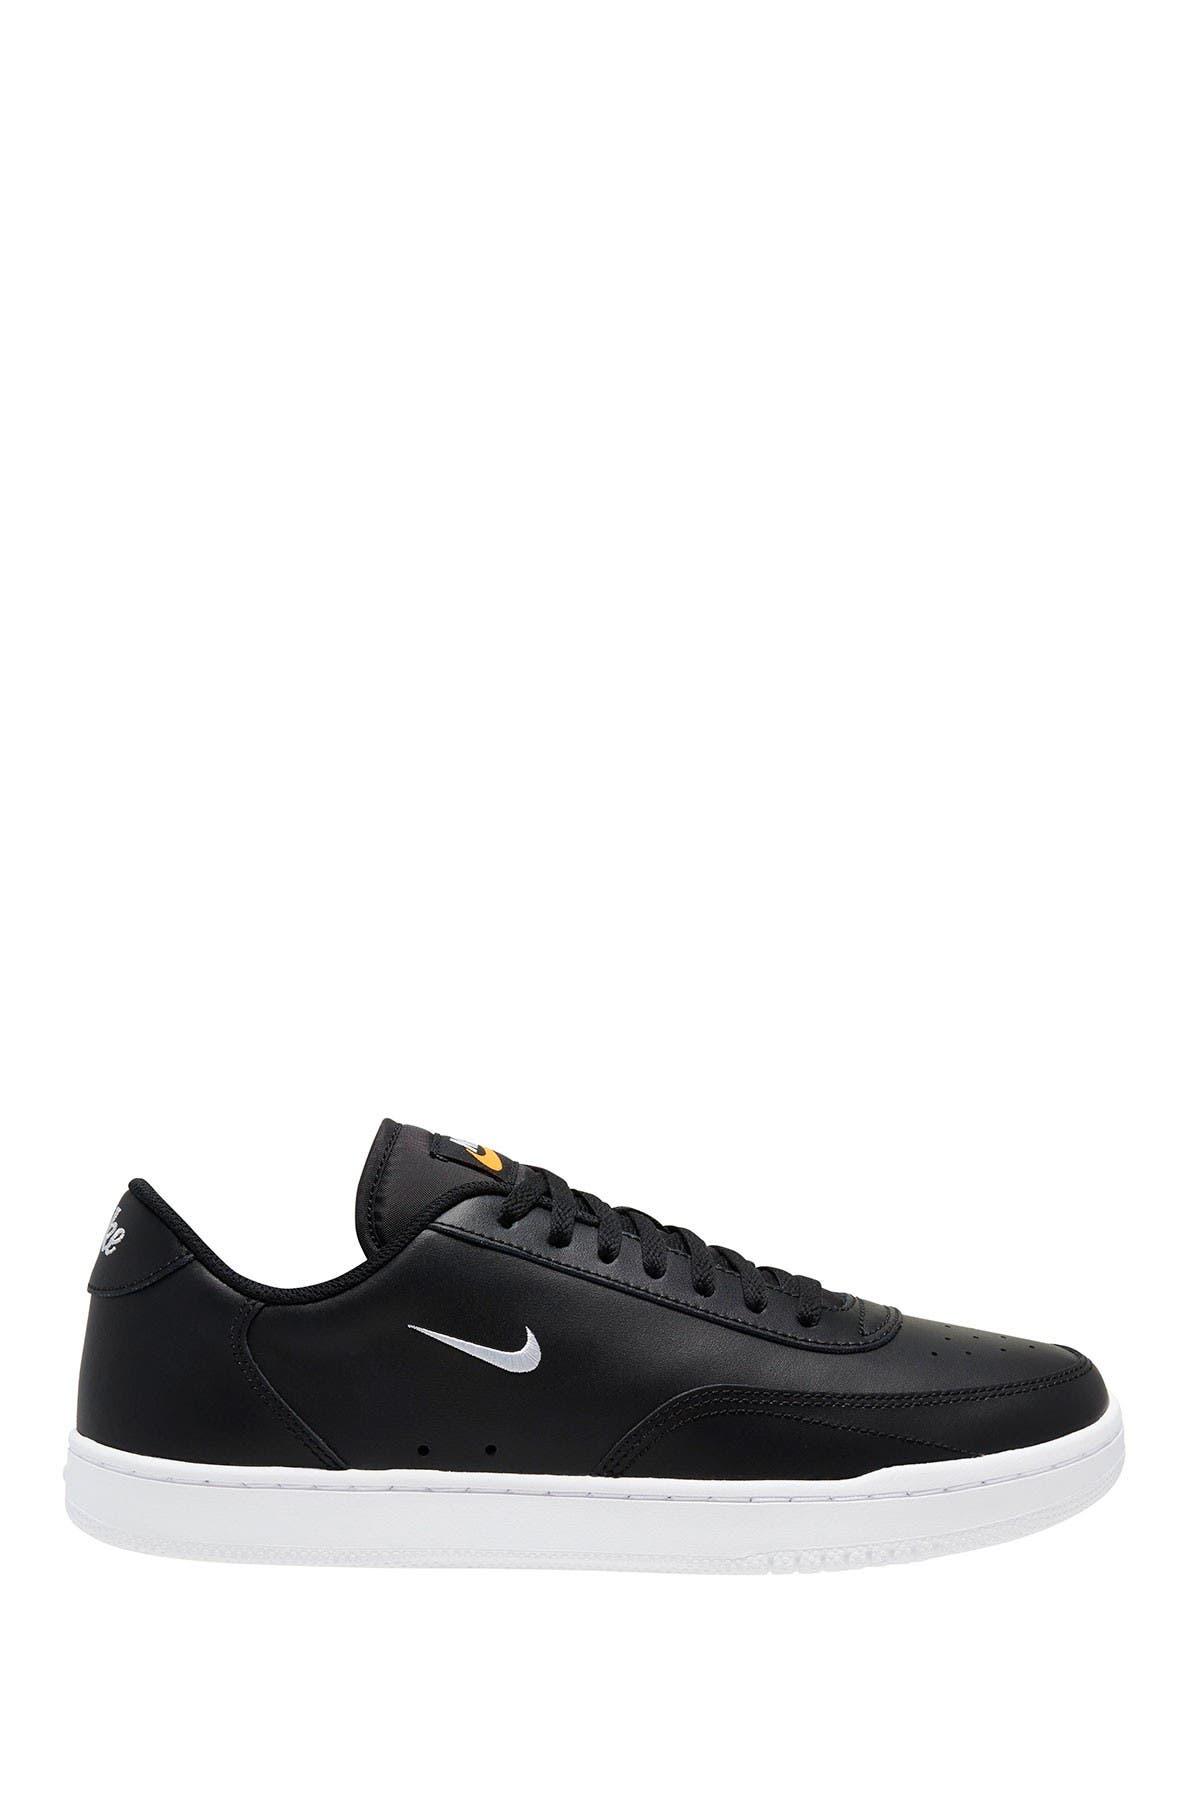 Image of Nike Court Vintage Sneaker